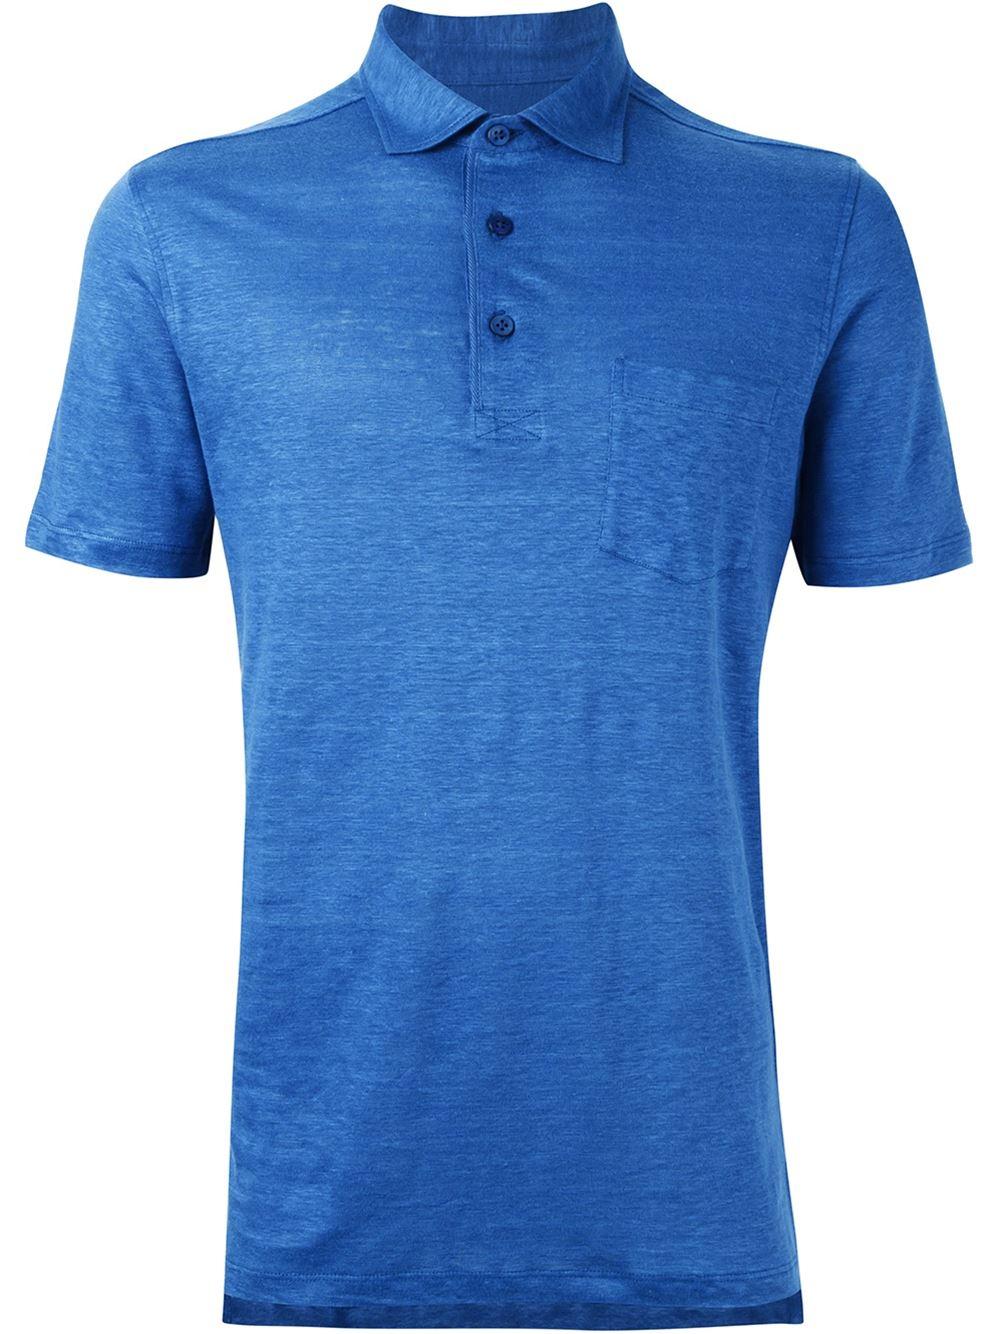 ermenegildo zegna classic polo shirt in blue for men